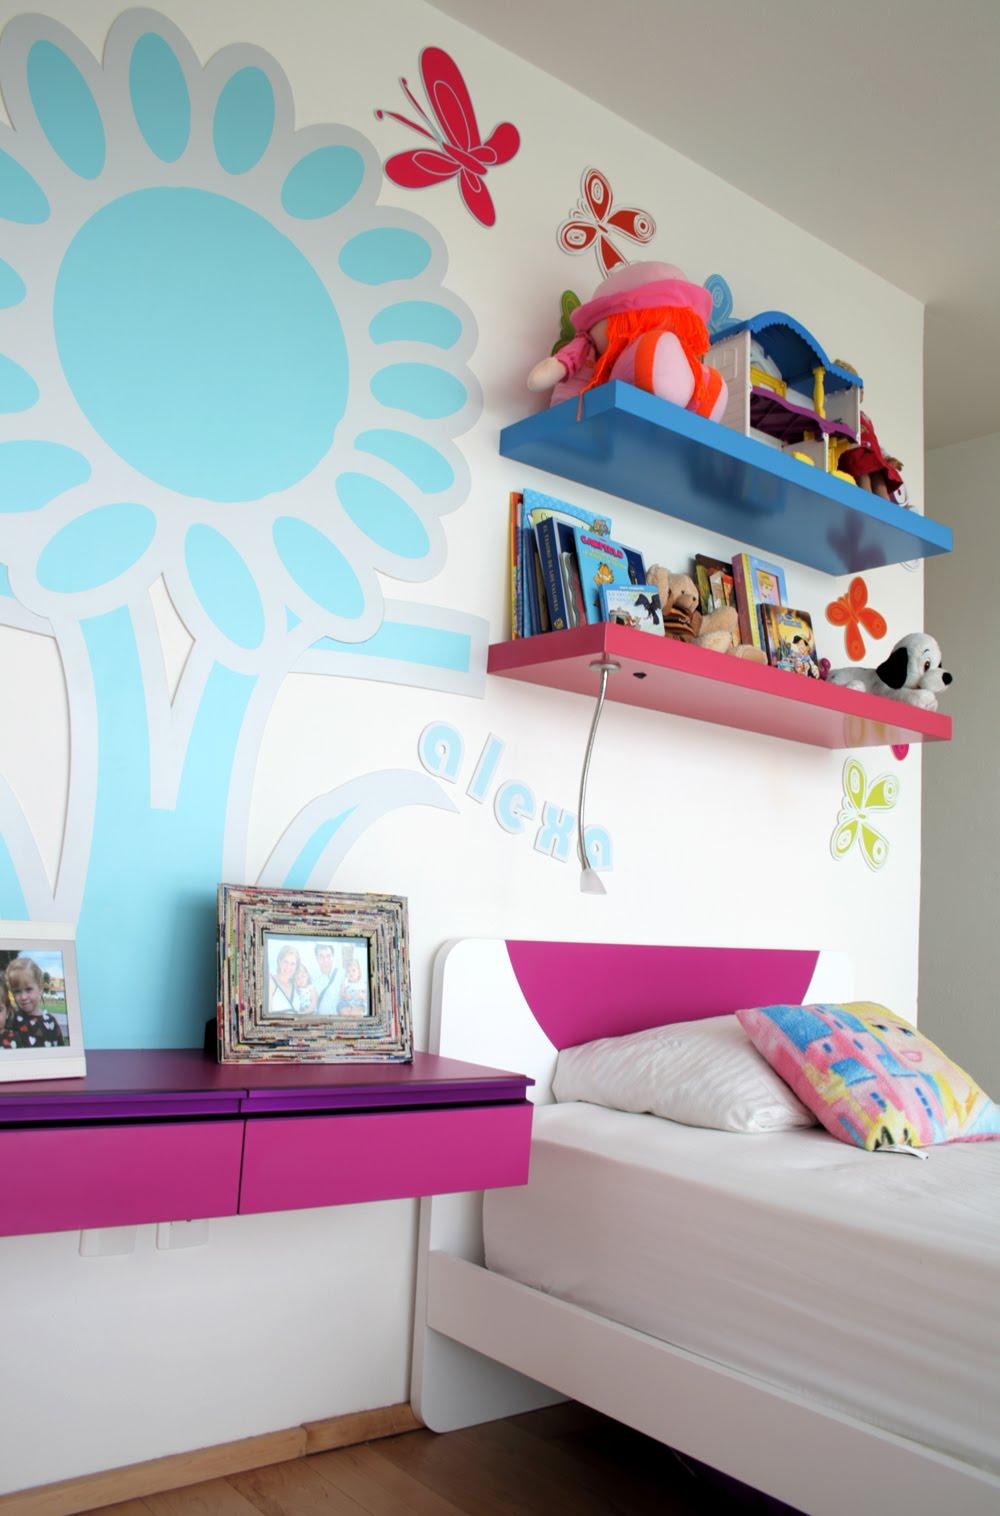 Cubo 3 taller de dise o muebles infantiles habitacion - Diseno habitacion infantil ...